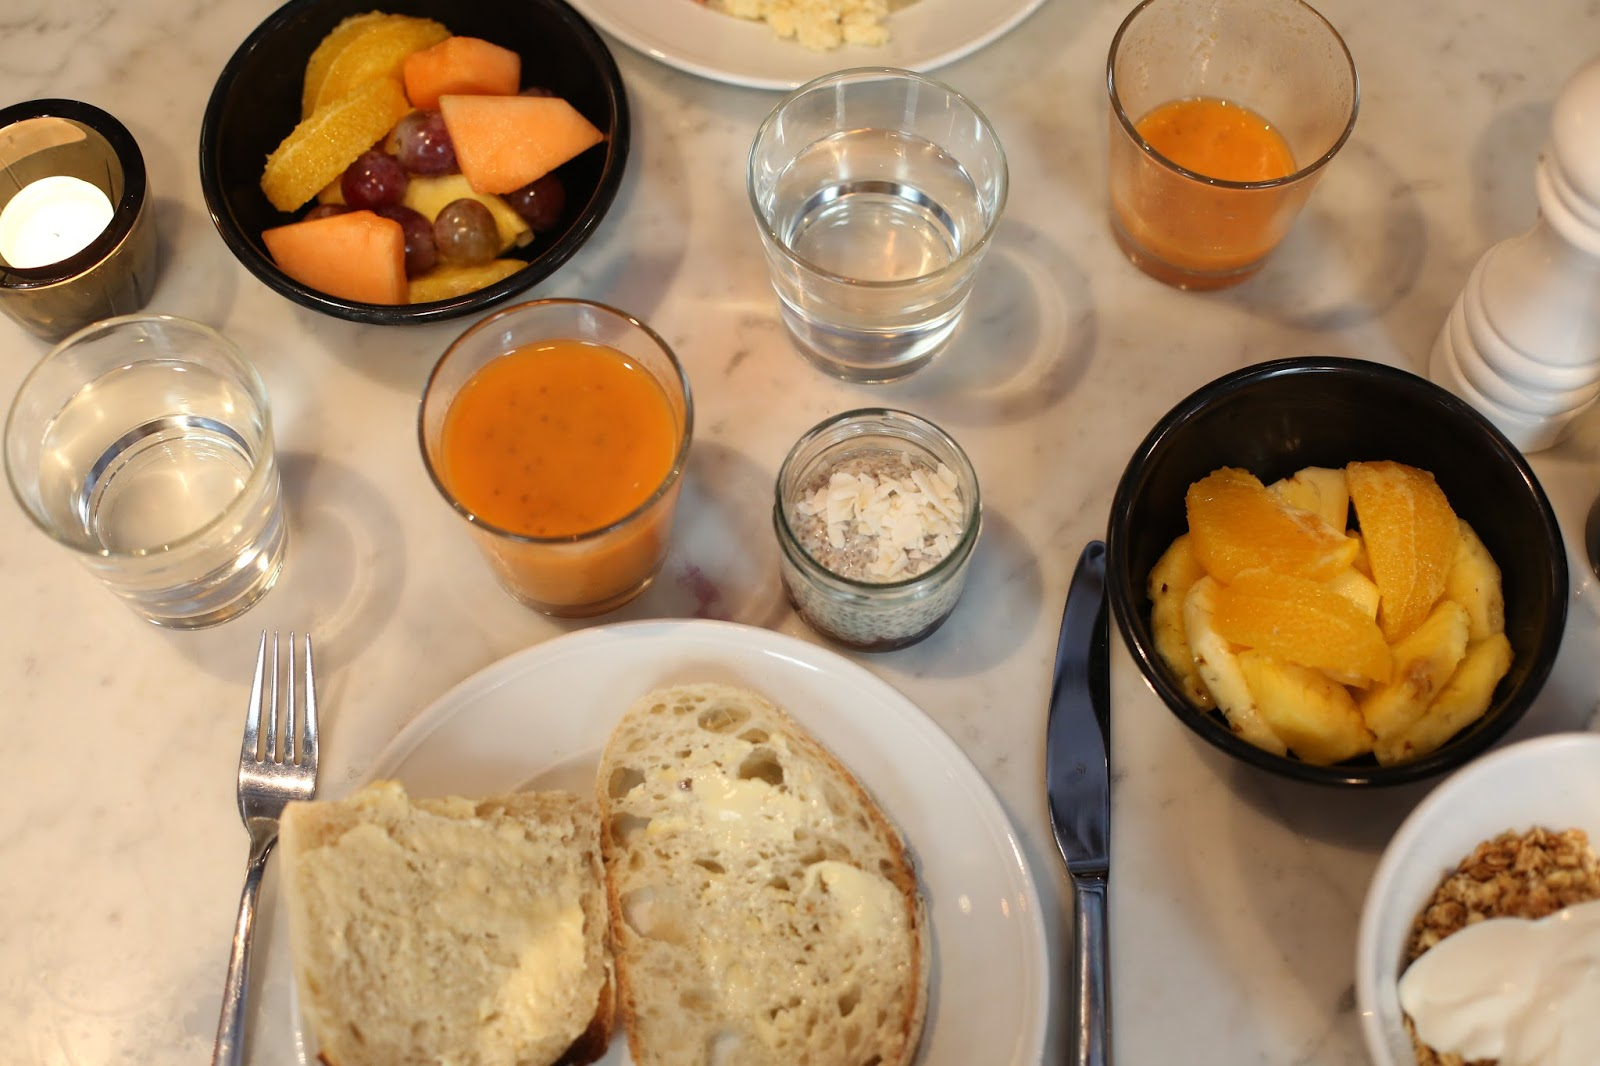 breakfast at urban deli